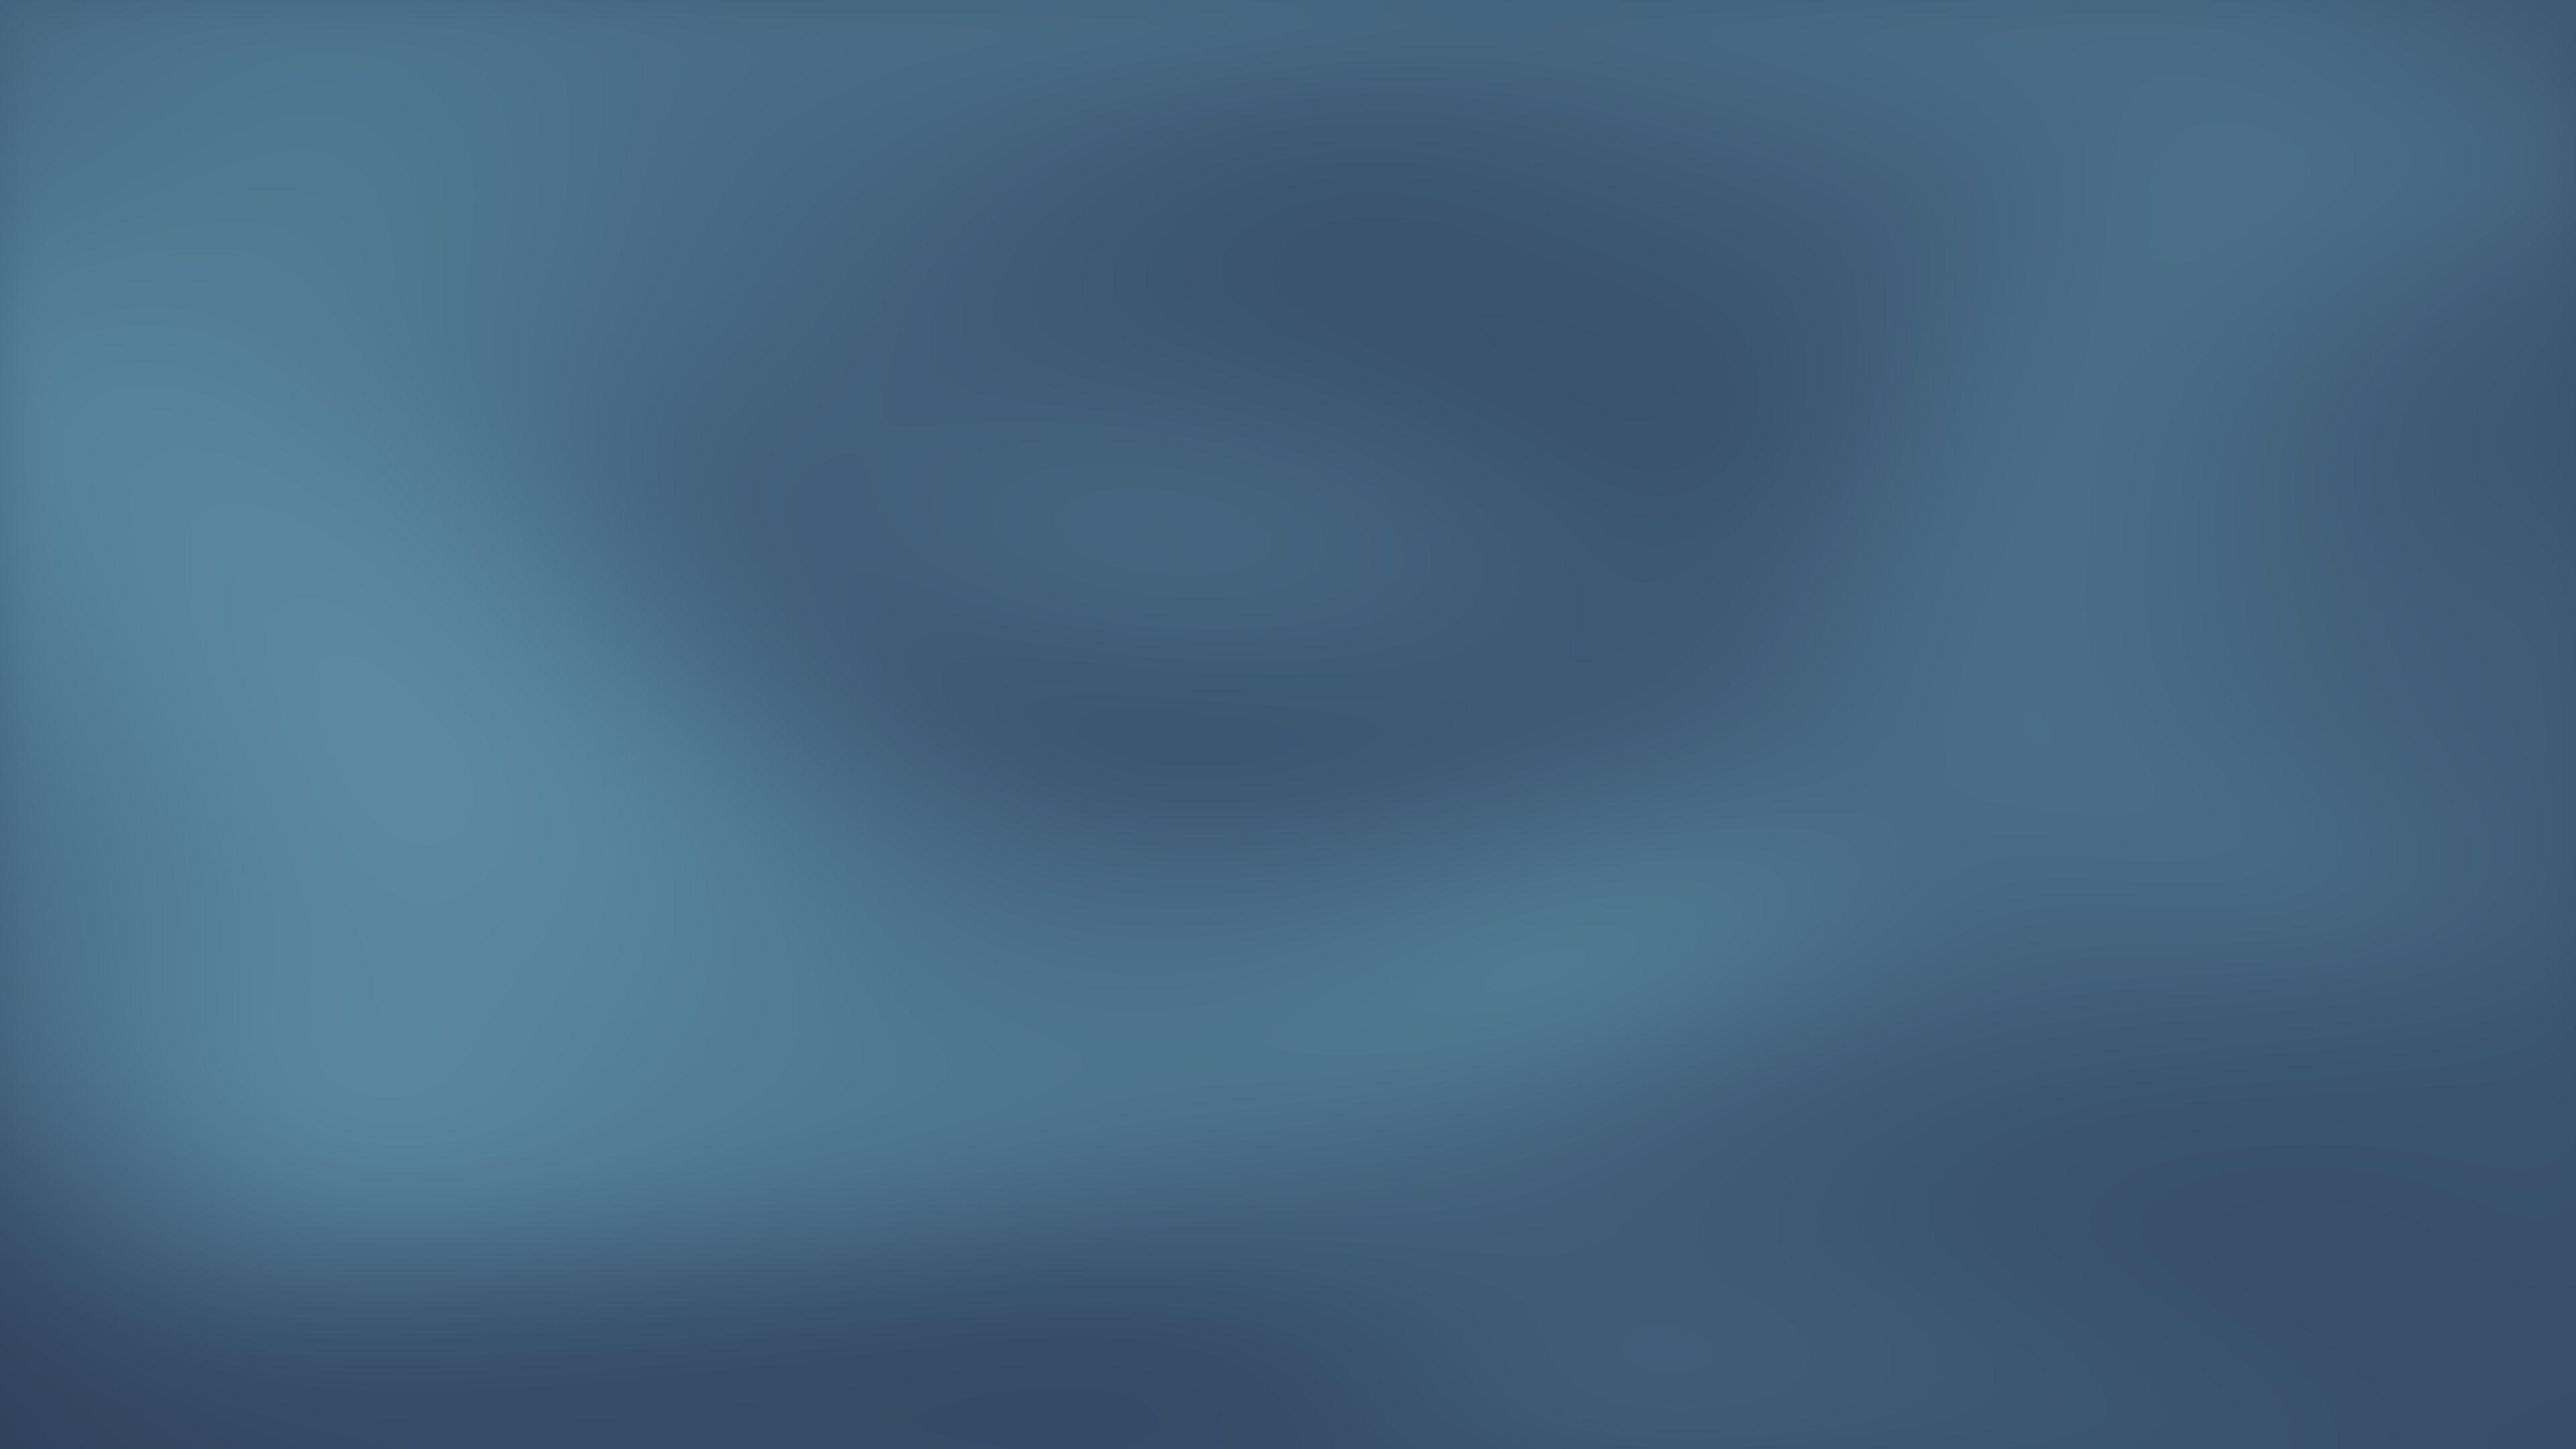 organic blue simple blue waves motion background loop sample3